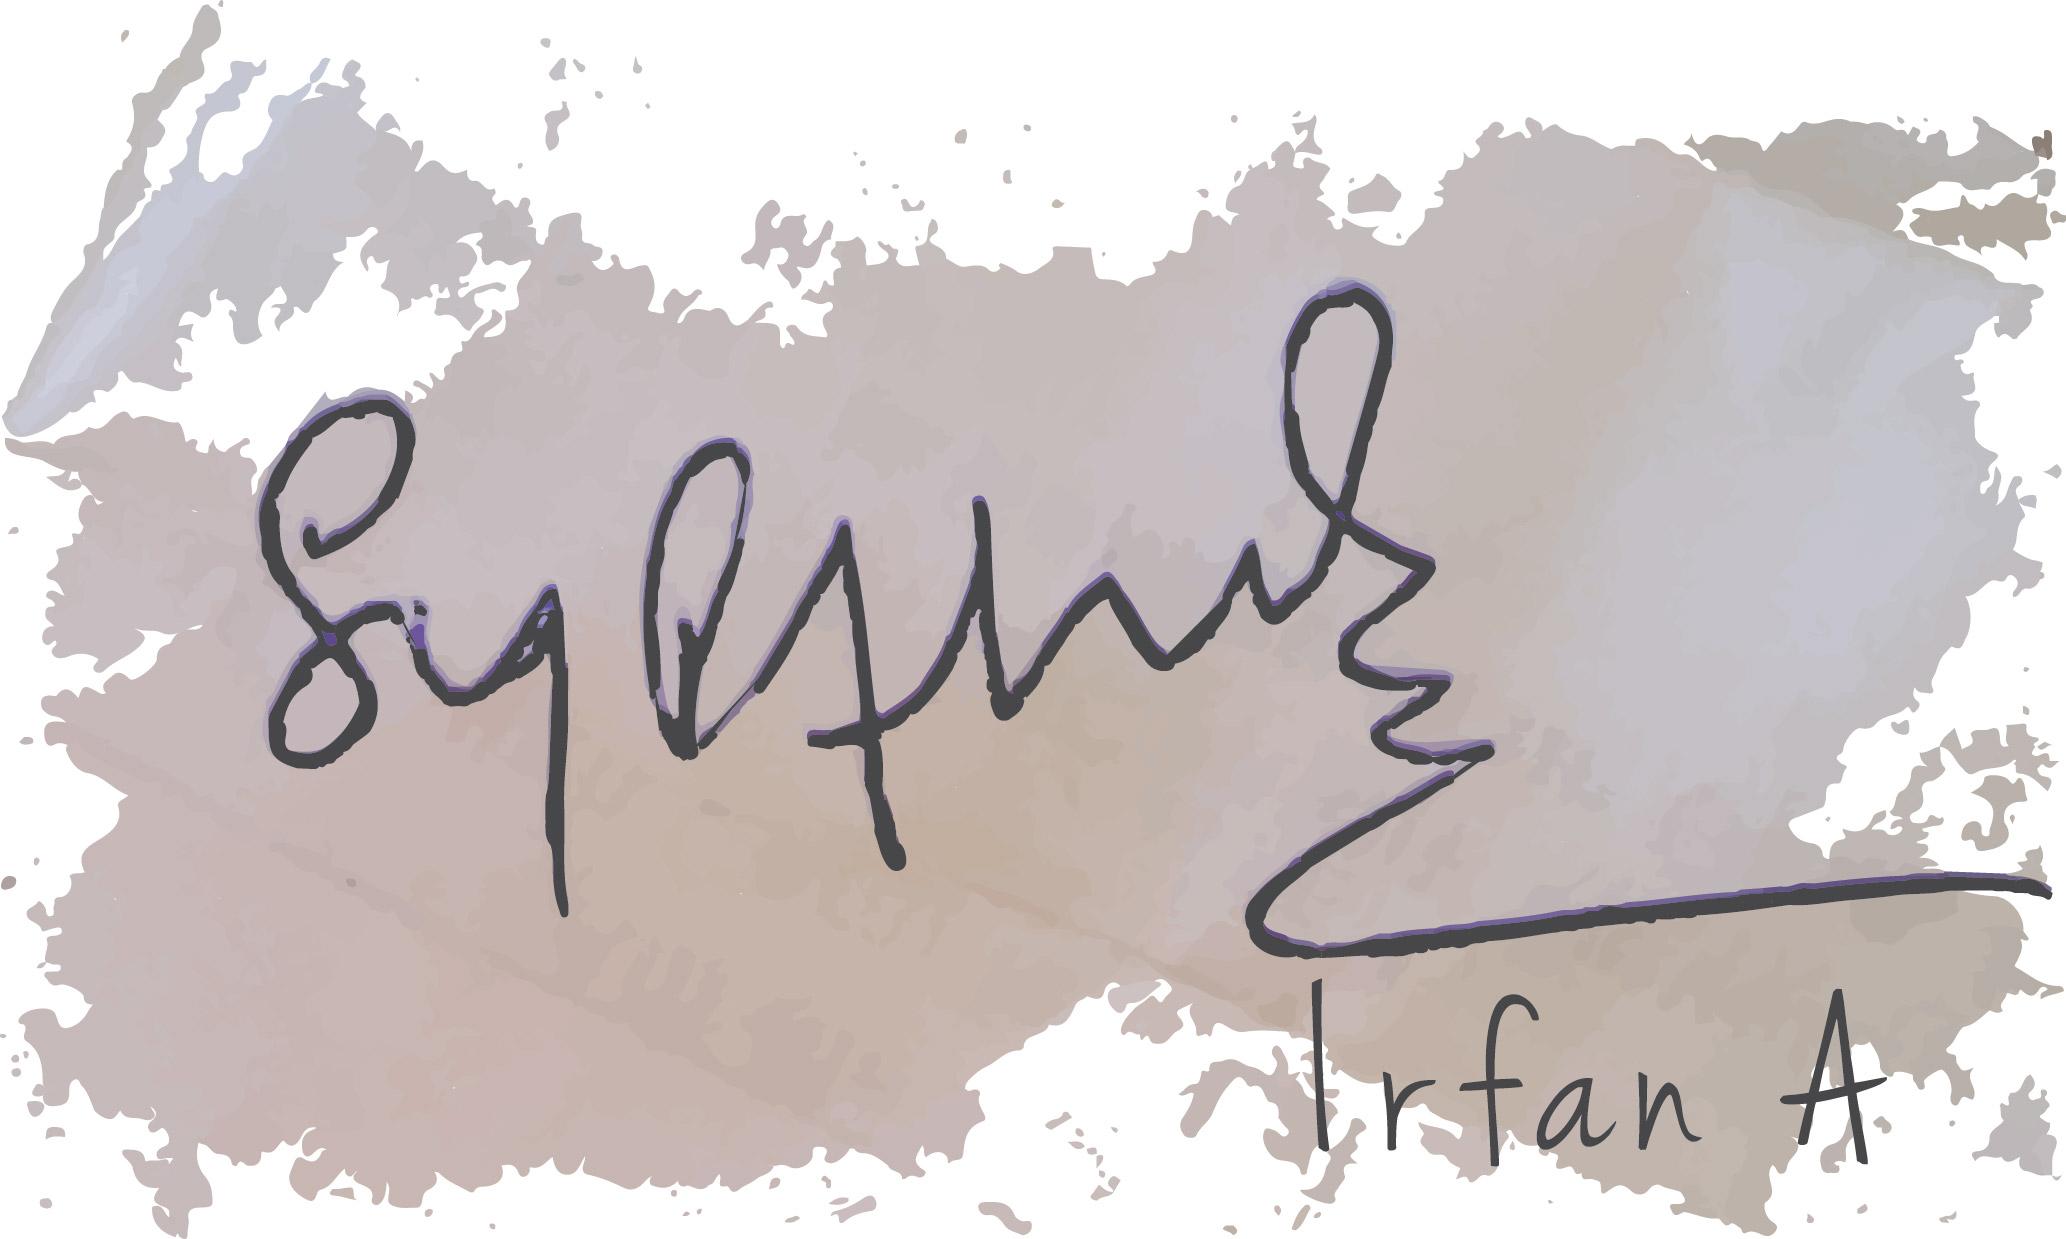 Irfan Ali Signature